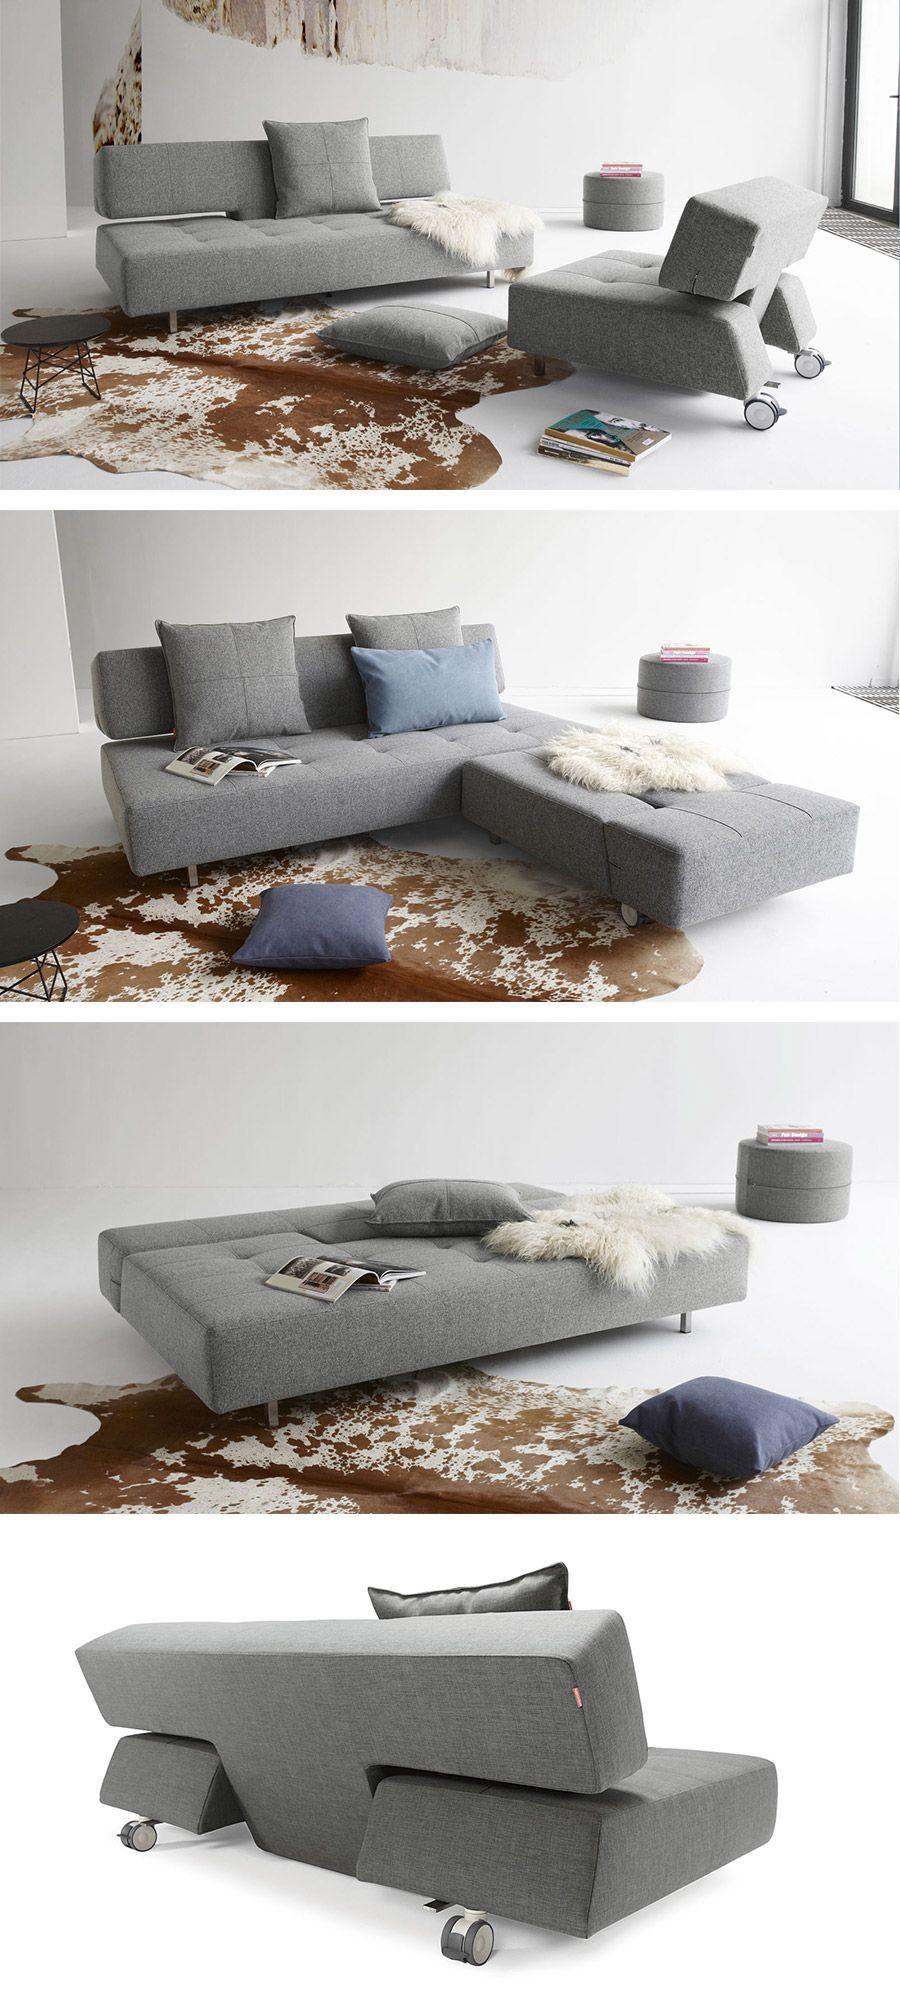 Schlafsofa Fur Wohnzimmer Modular Sofa Bed Modern Sofa Designs Luxury Sofa